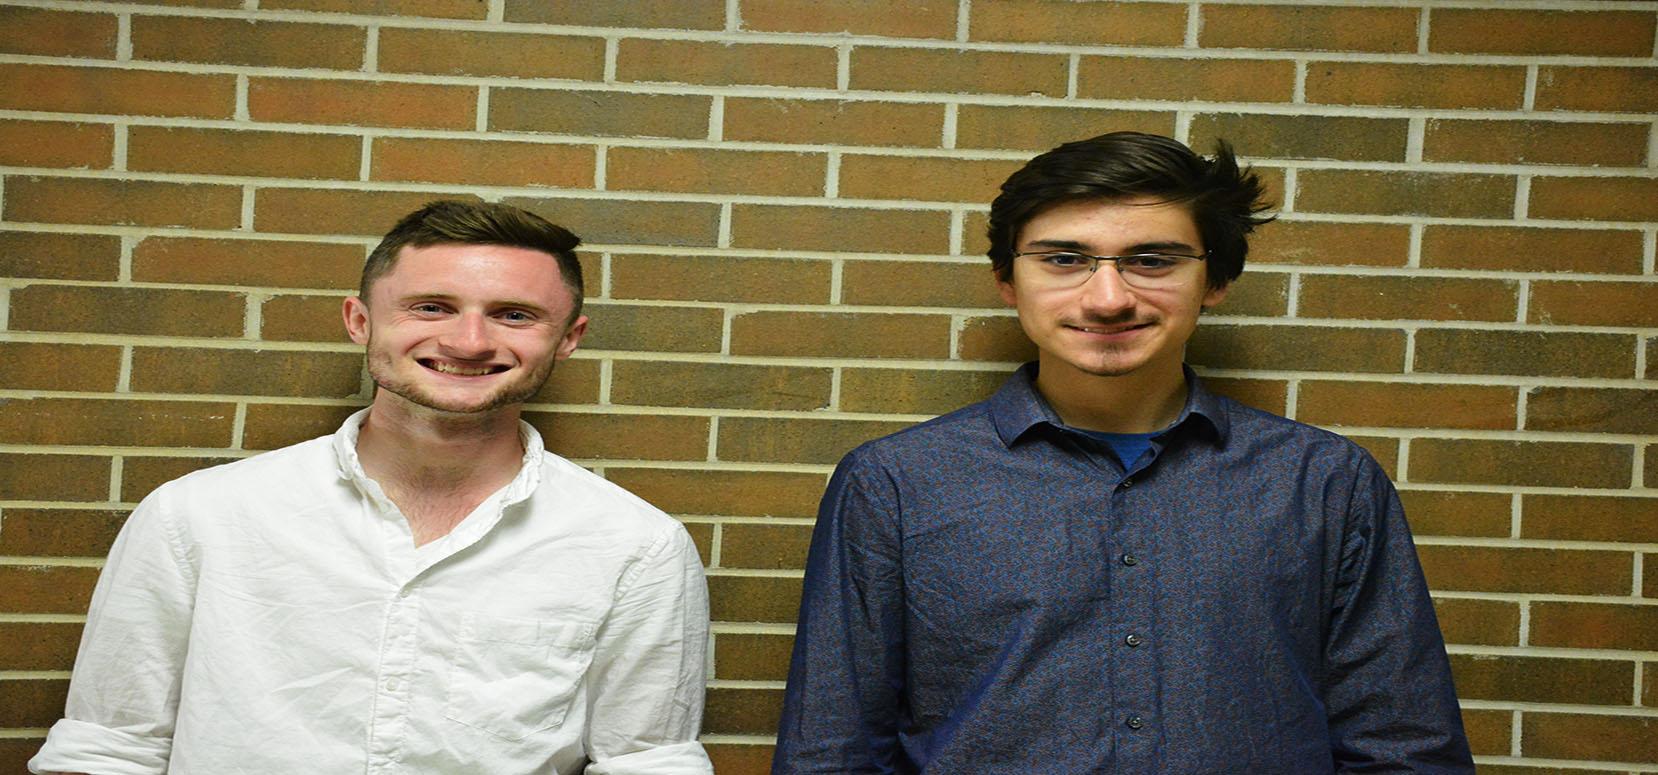 From left to right: Freshmen  engineering major and new study body president Lucas Frey and his running mate freshmen engineering major and new vice president Skylar Lopez-Kohler.